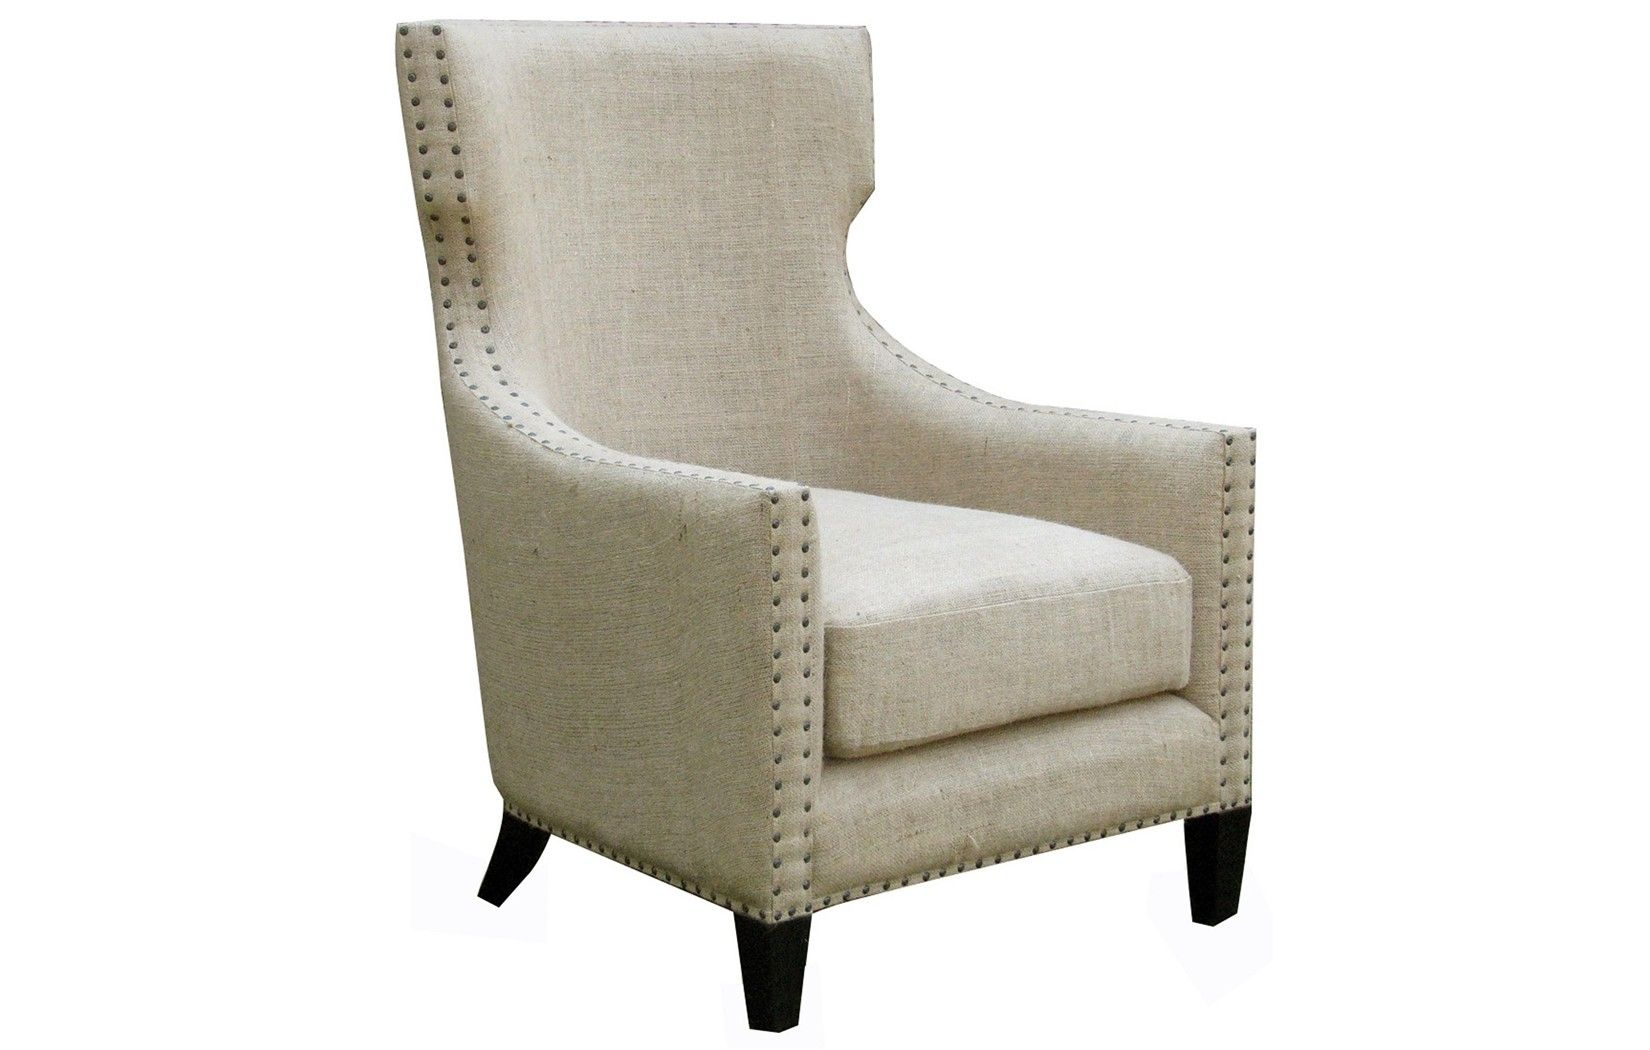 Berne Single Chair from NOIR CFC Furniture LA. Dimensions: 30\